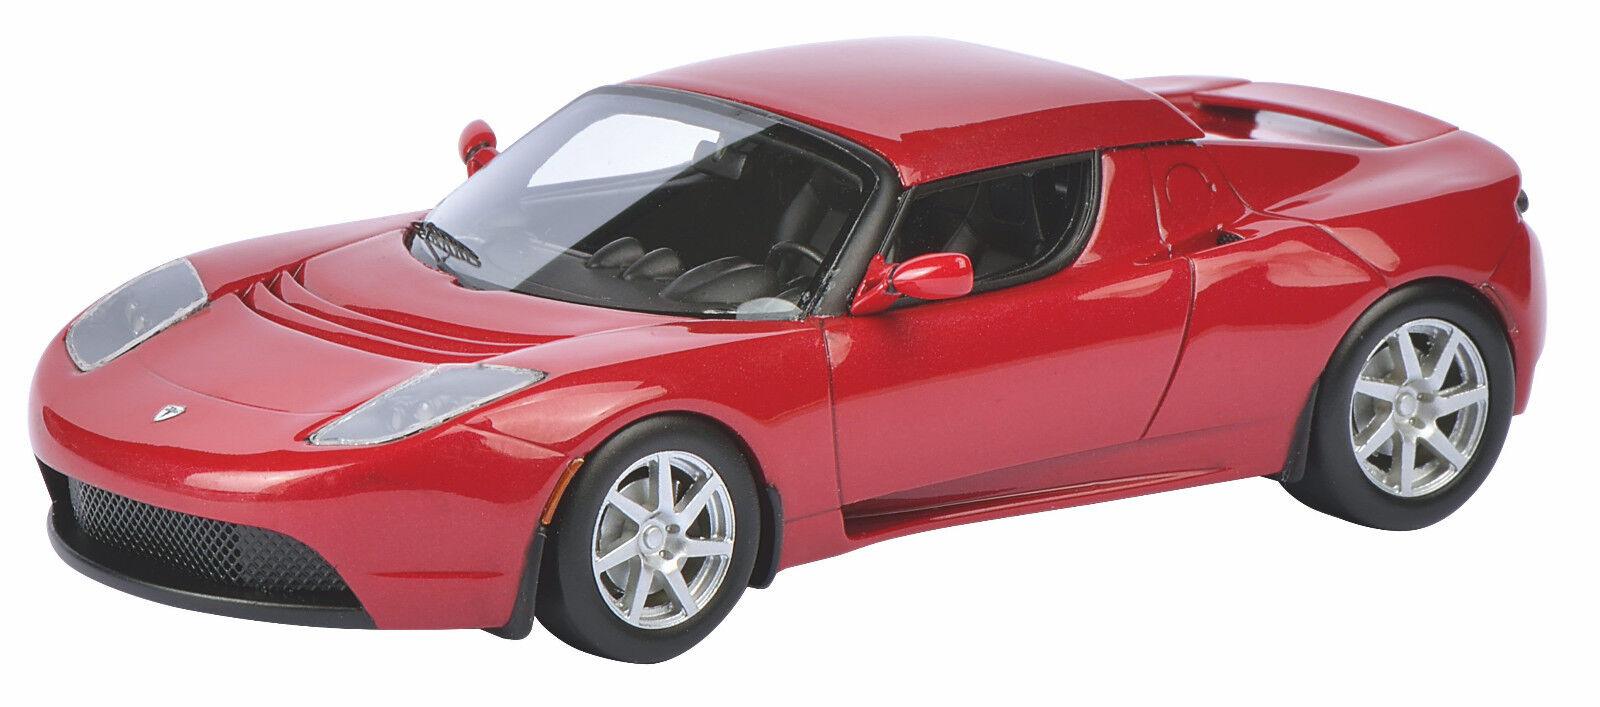 Schuco 450897700 Tesla Roadster rigide-Rouge 1 43 NOUVEAU & NEUF dans sa boîte